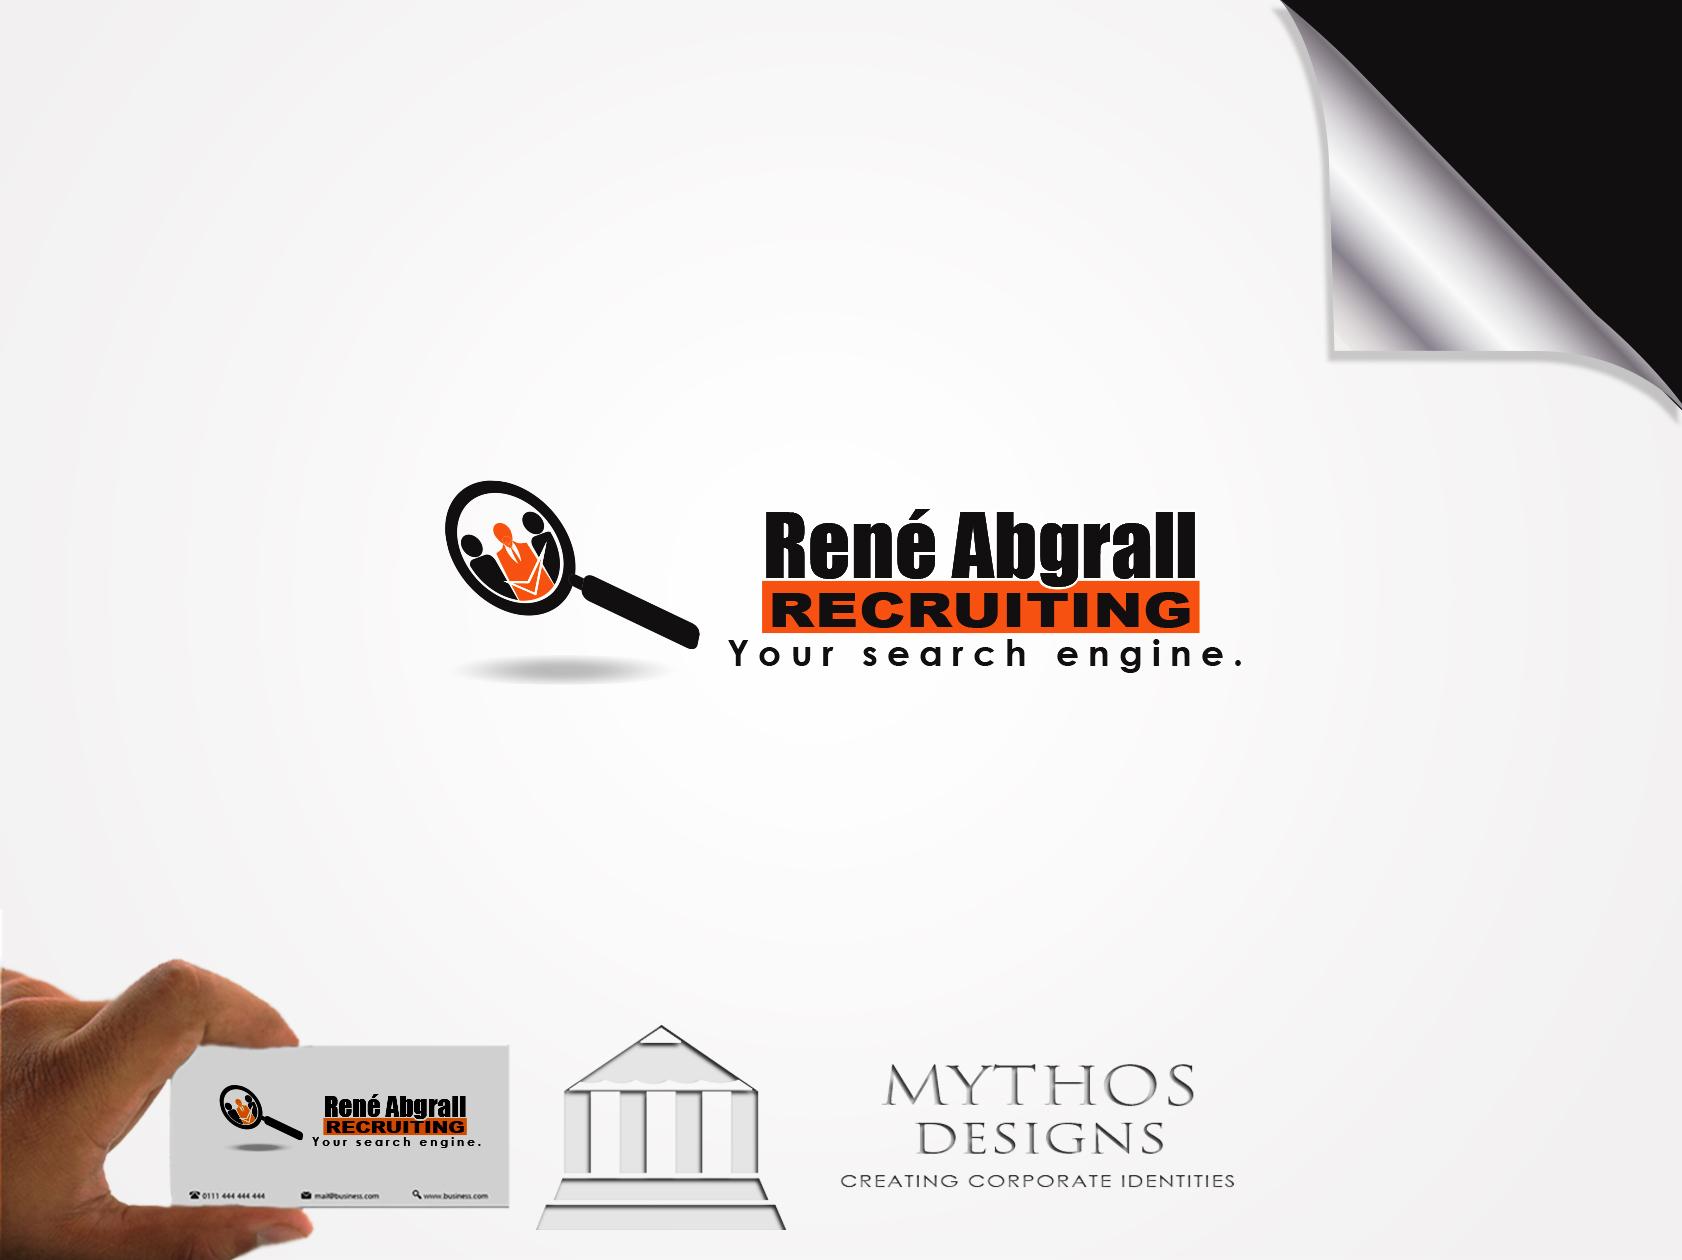 Logo Design by Mythos Designs - Entry No. 16 in the Logo Design Contest Artistic Logo Design for René Abgrall Recruiting.